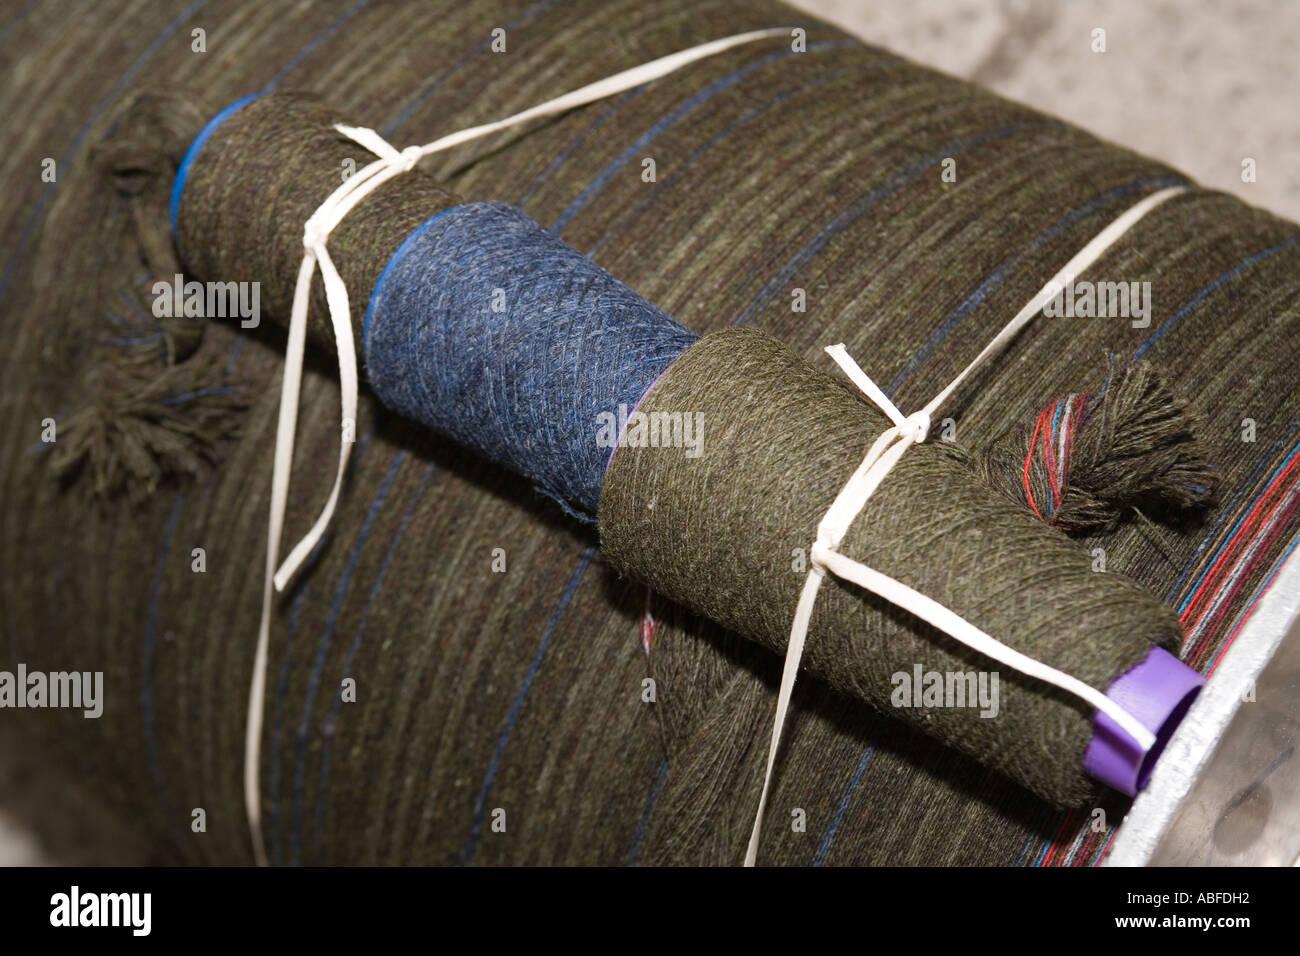 UK Scotland Western Isles Outer Hebrides Lewis Stornoway Harris Tweed warped yarn ready for handweaving - Stock Image